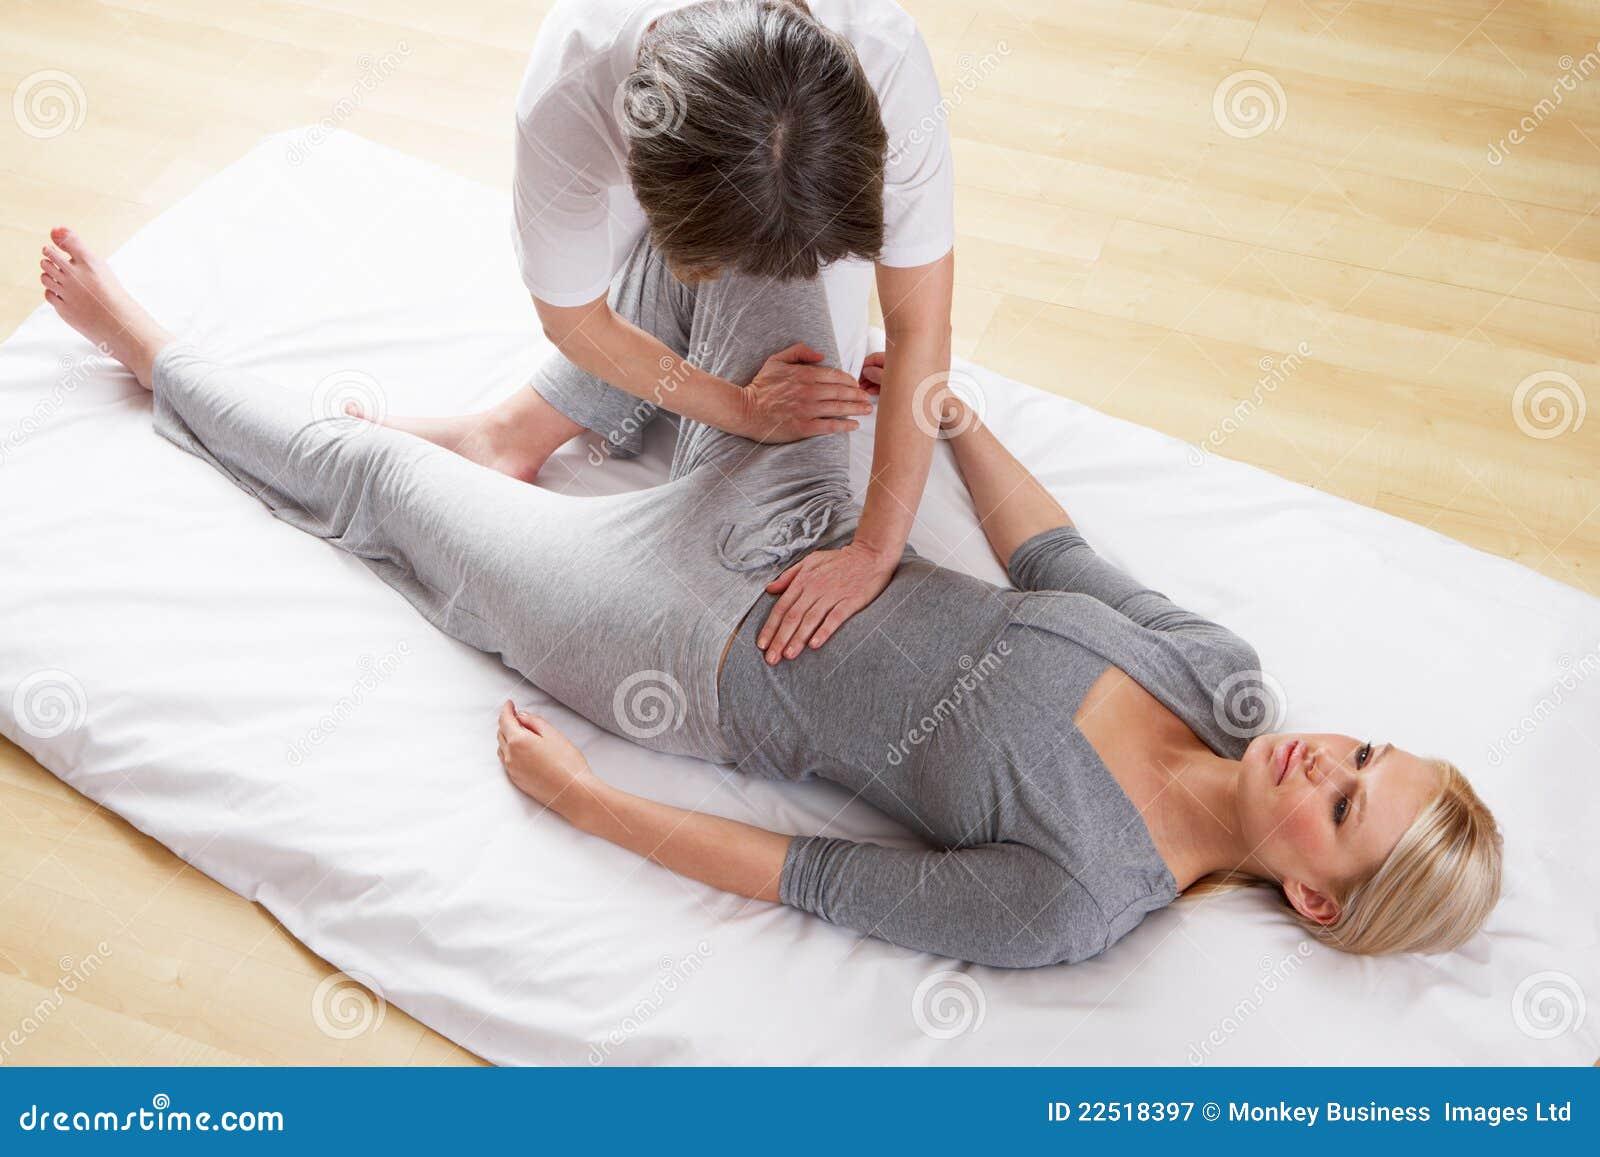 Women Having A Massage - Gonzo Porn Movies-9919